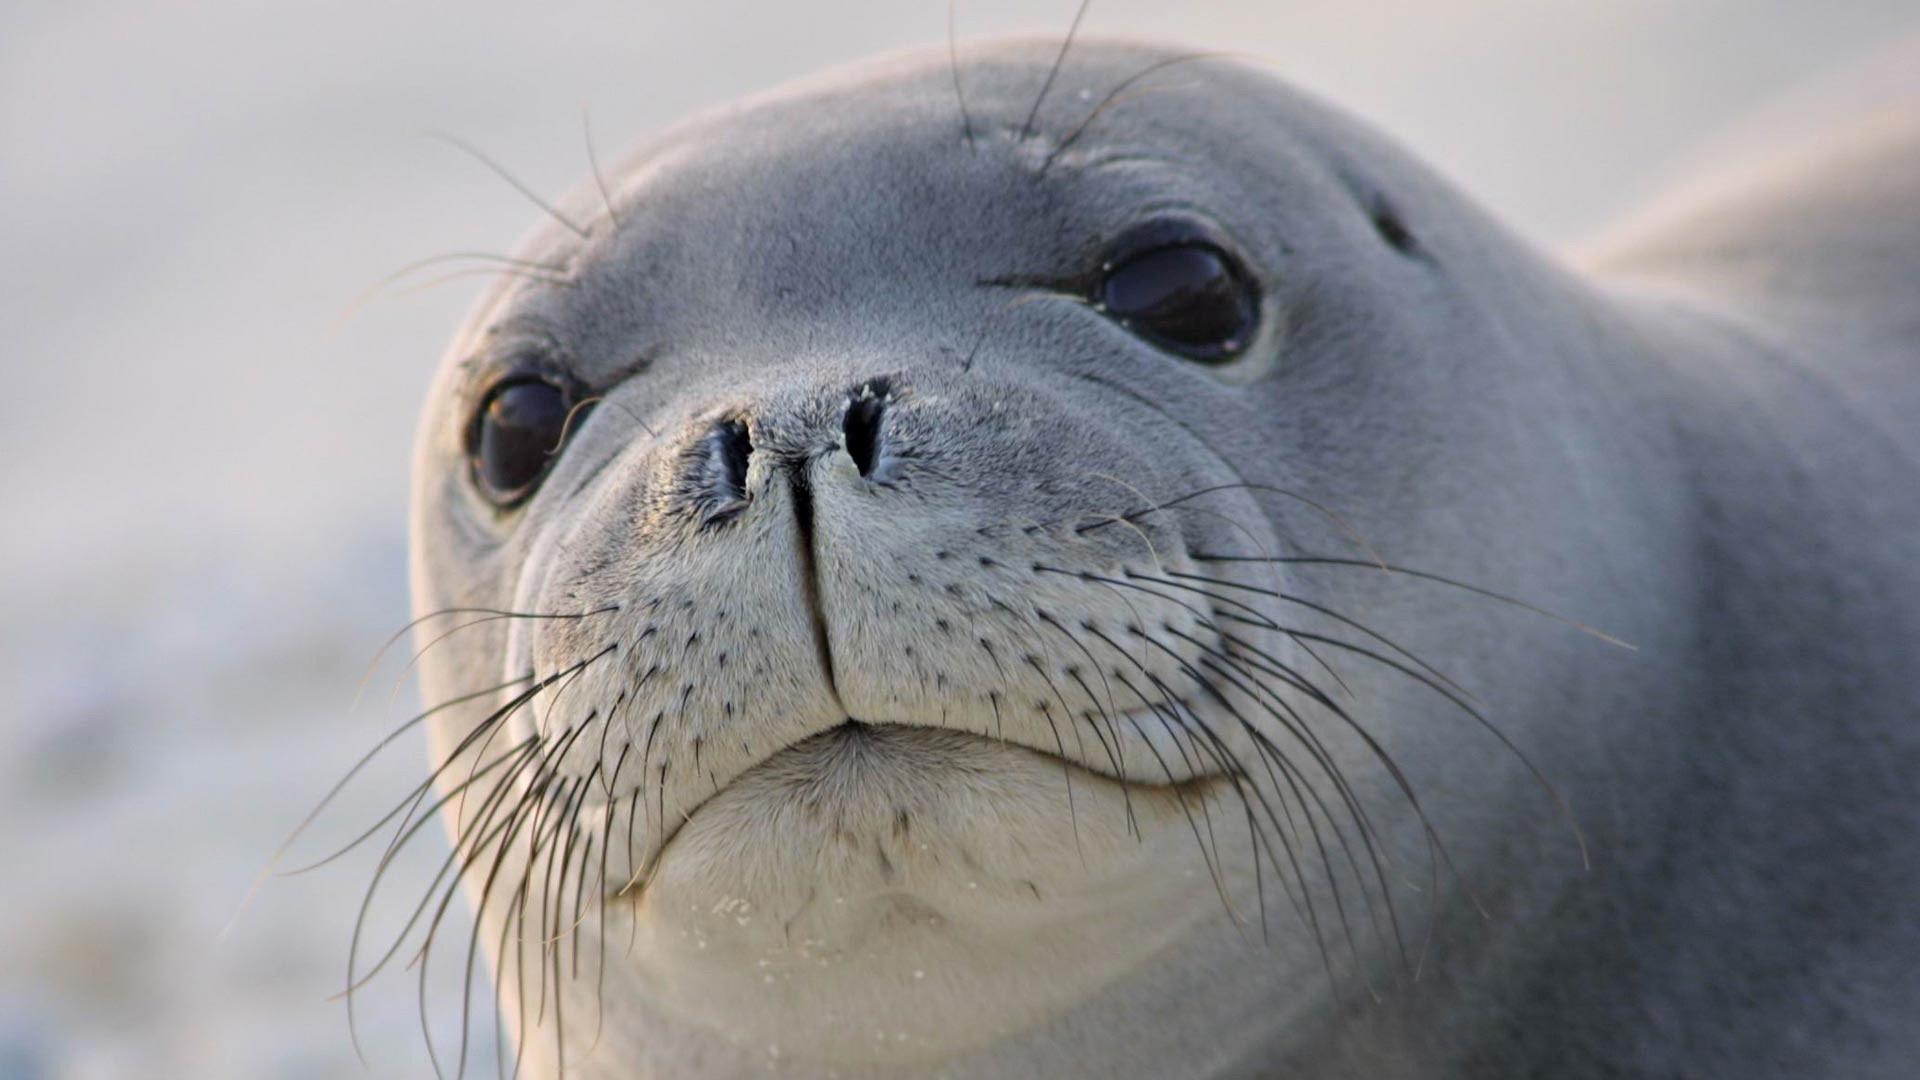 Fur Seal wallpaper for computer